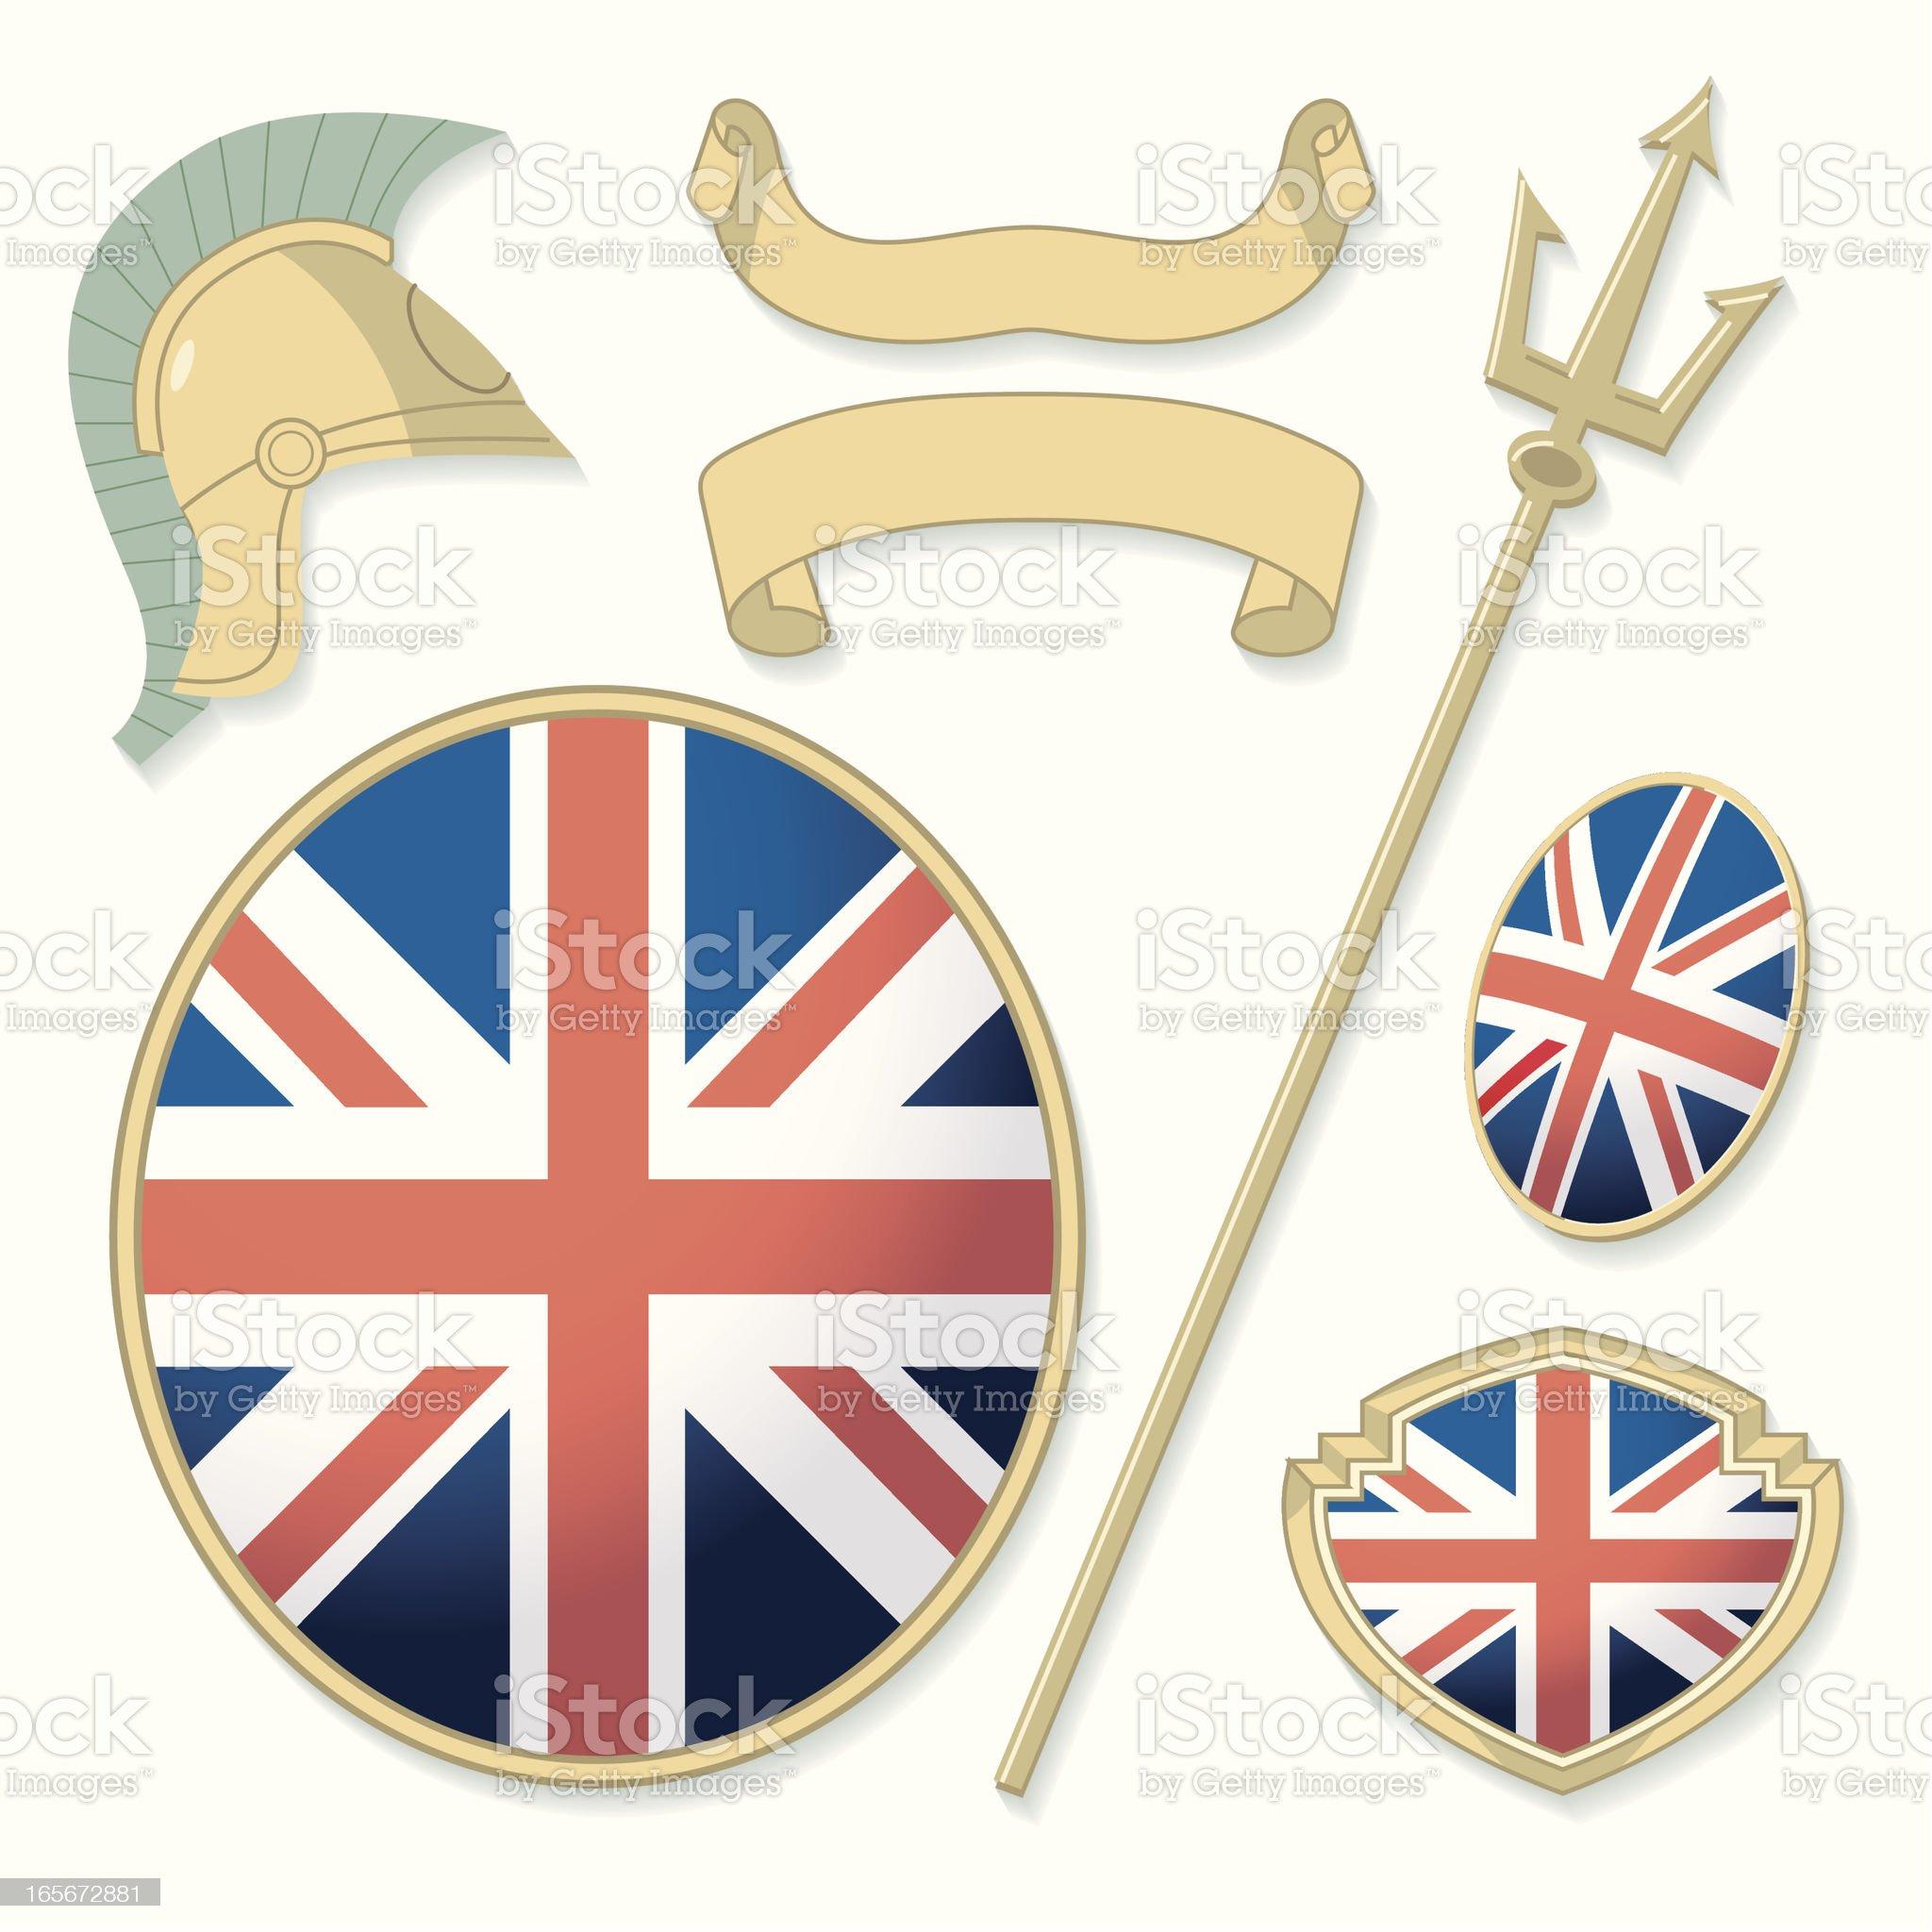 Britannic Elements royalty-free stock vector art